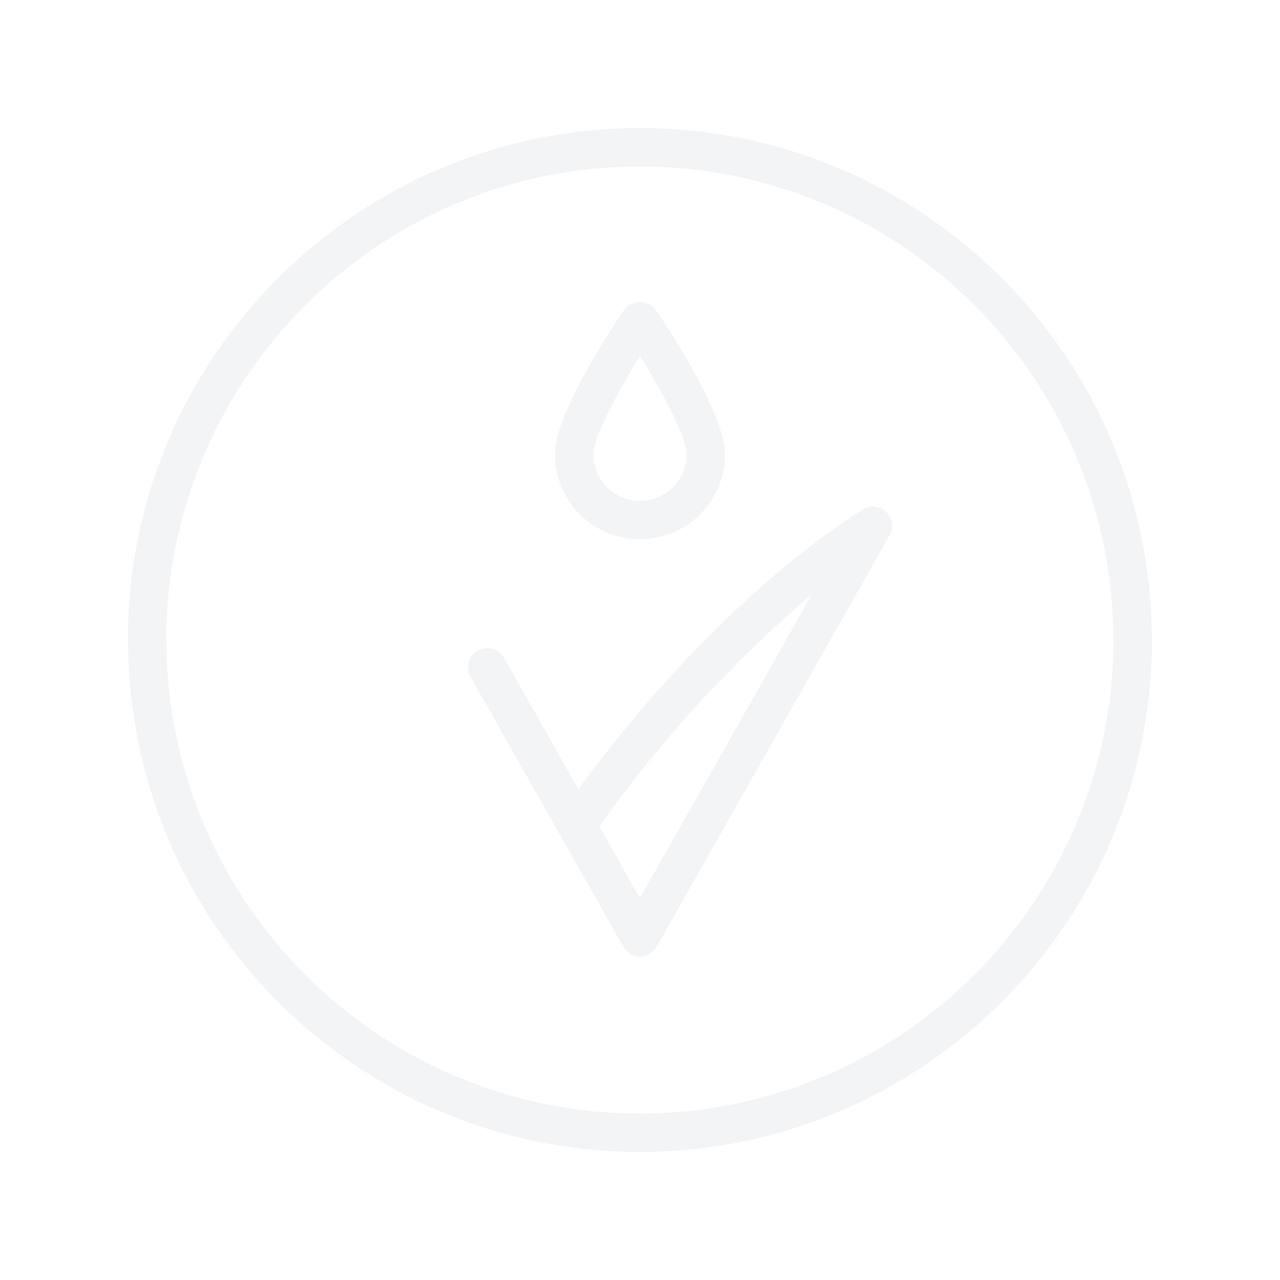 KLAIRS Gentle Black Sugar Facial Polish 110ml